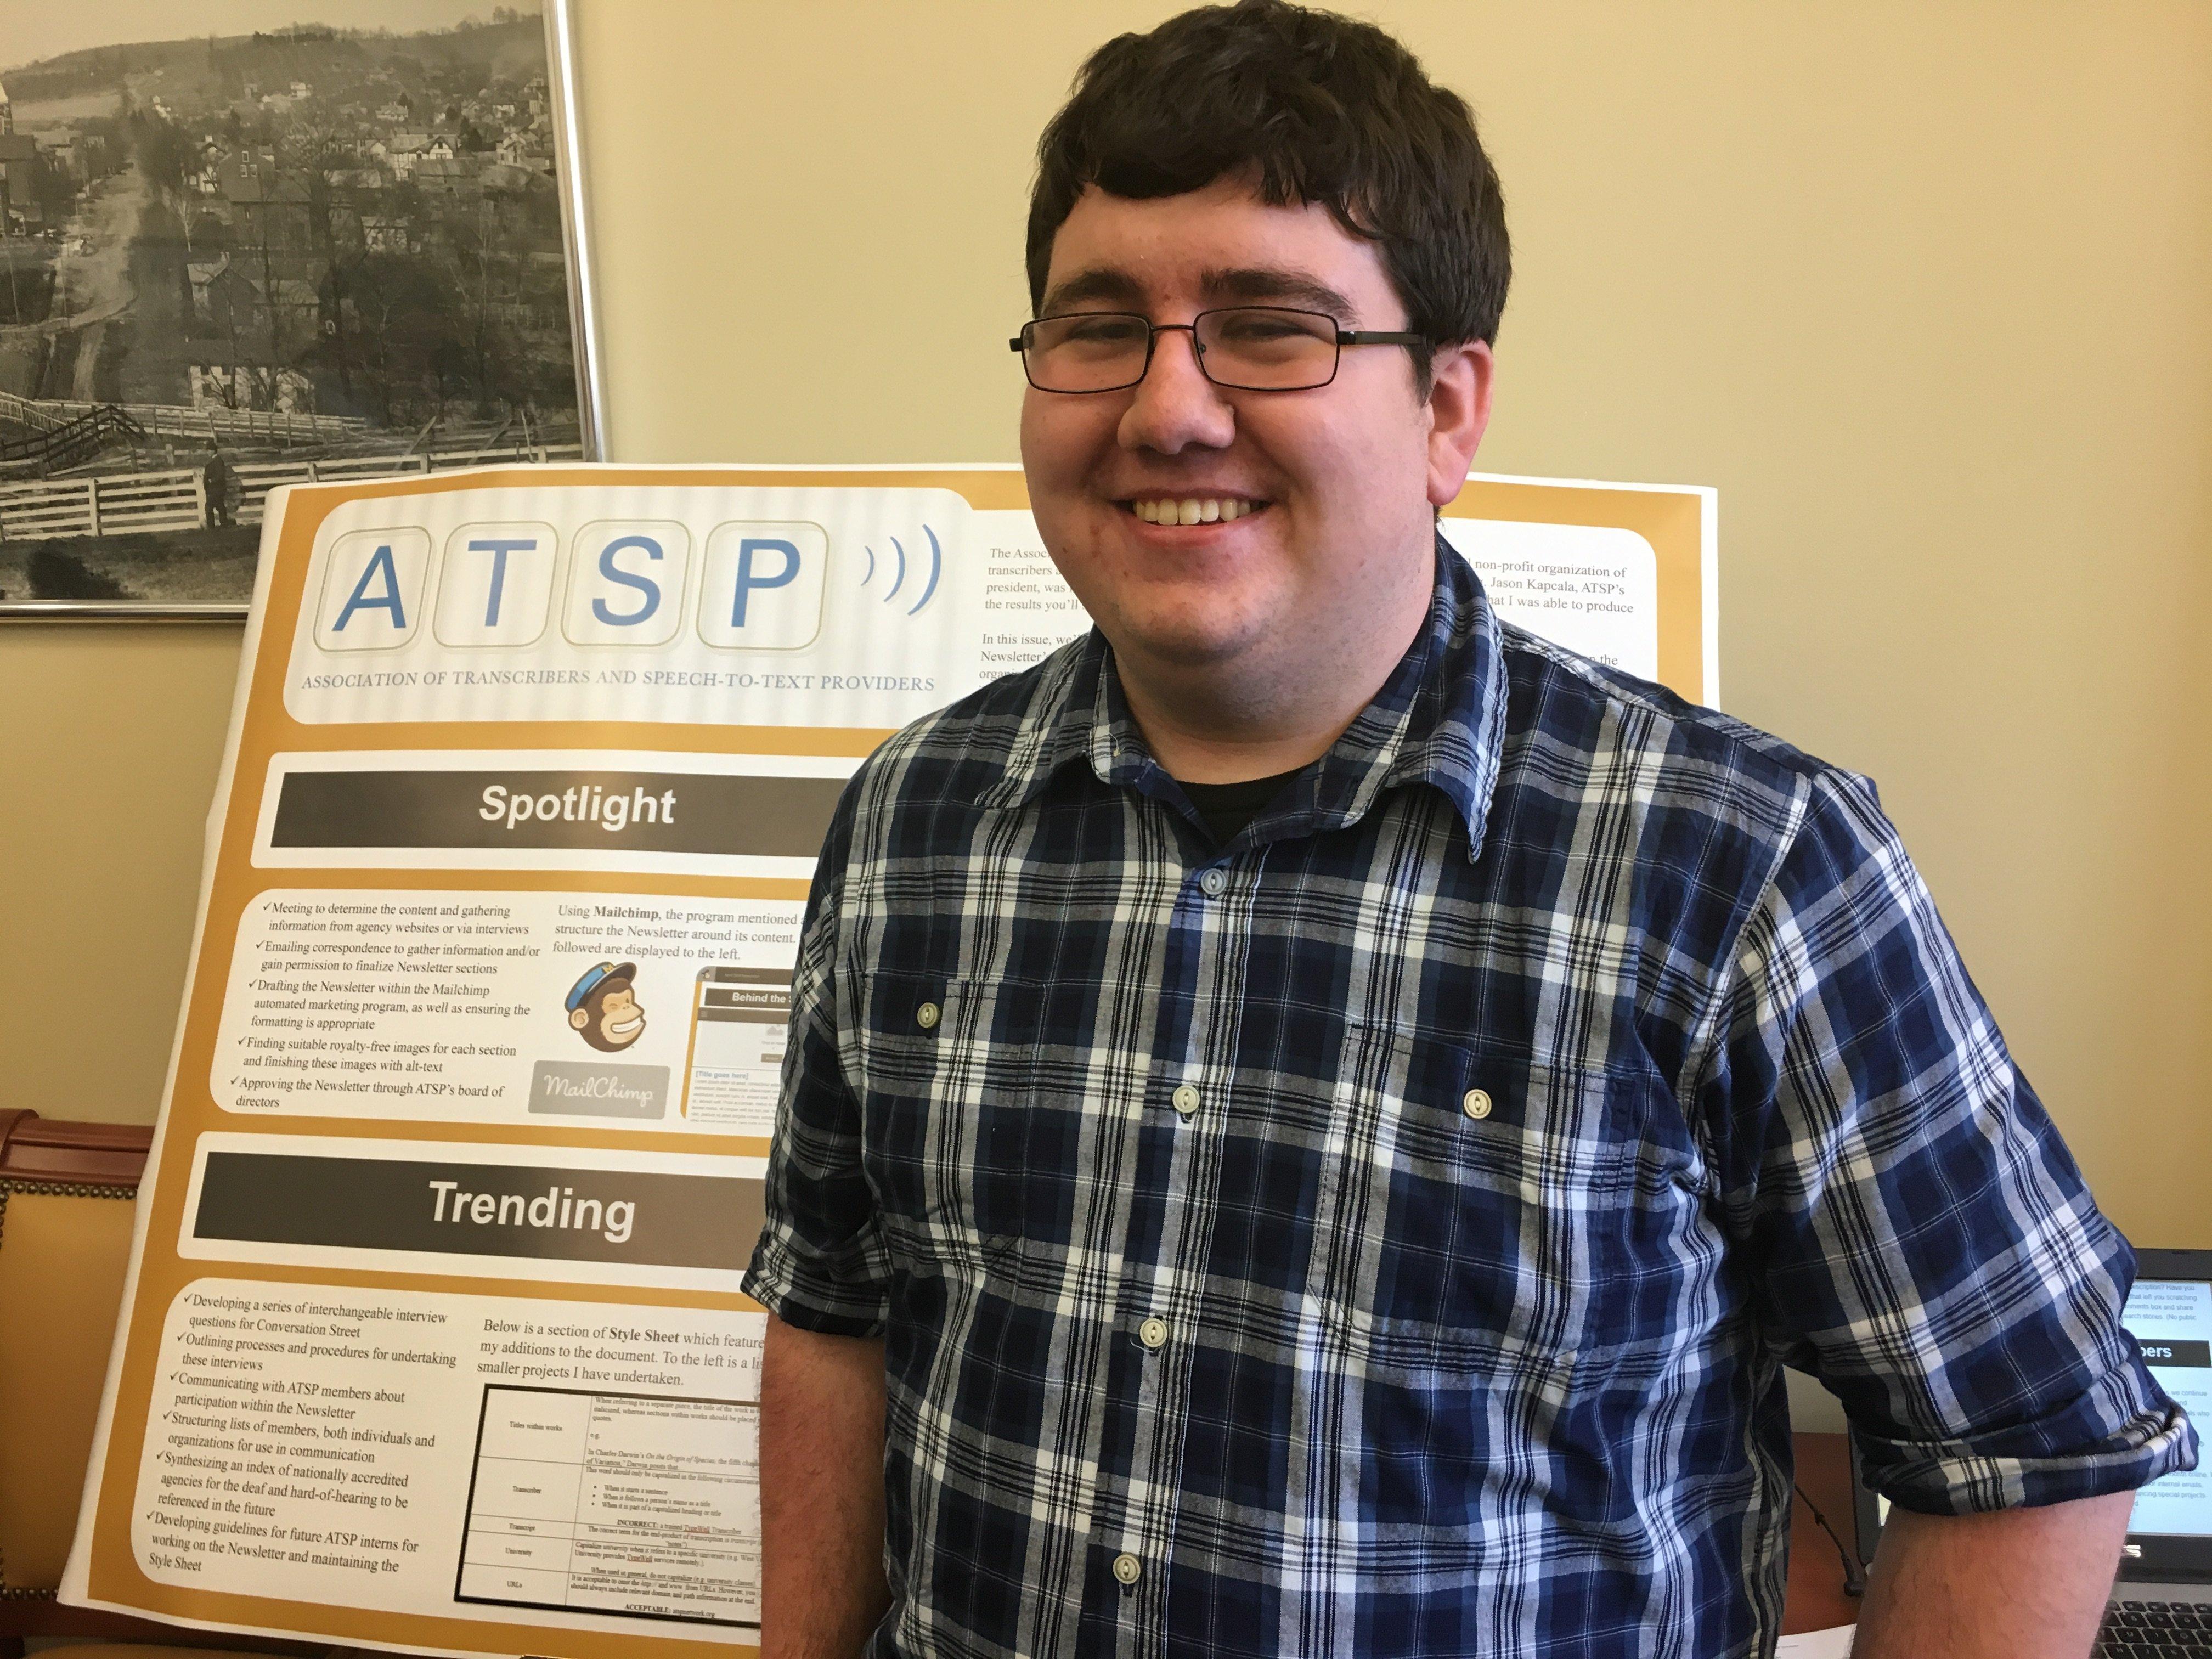 Intern Kody Goff standing in front of his internship poster presentation